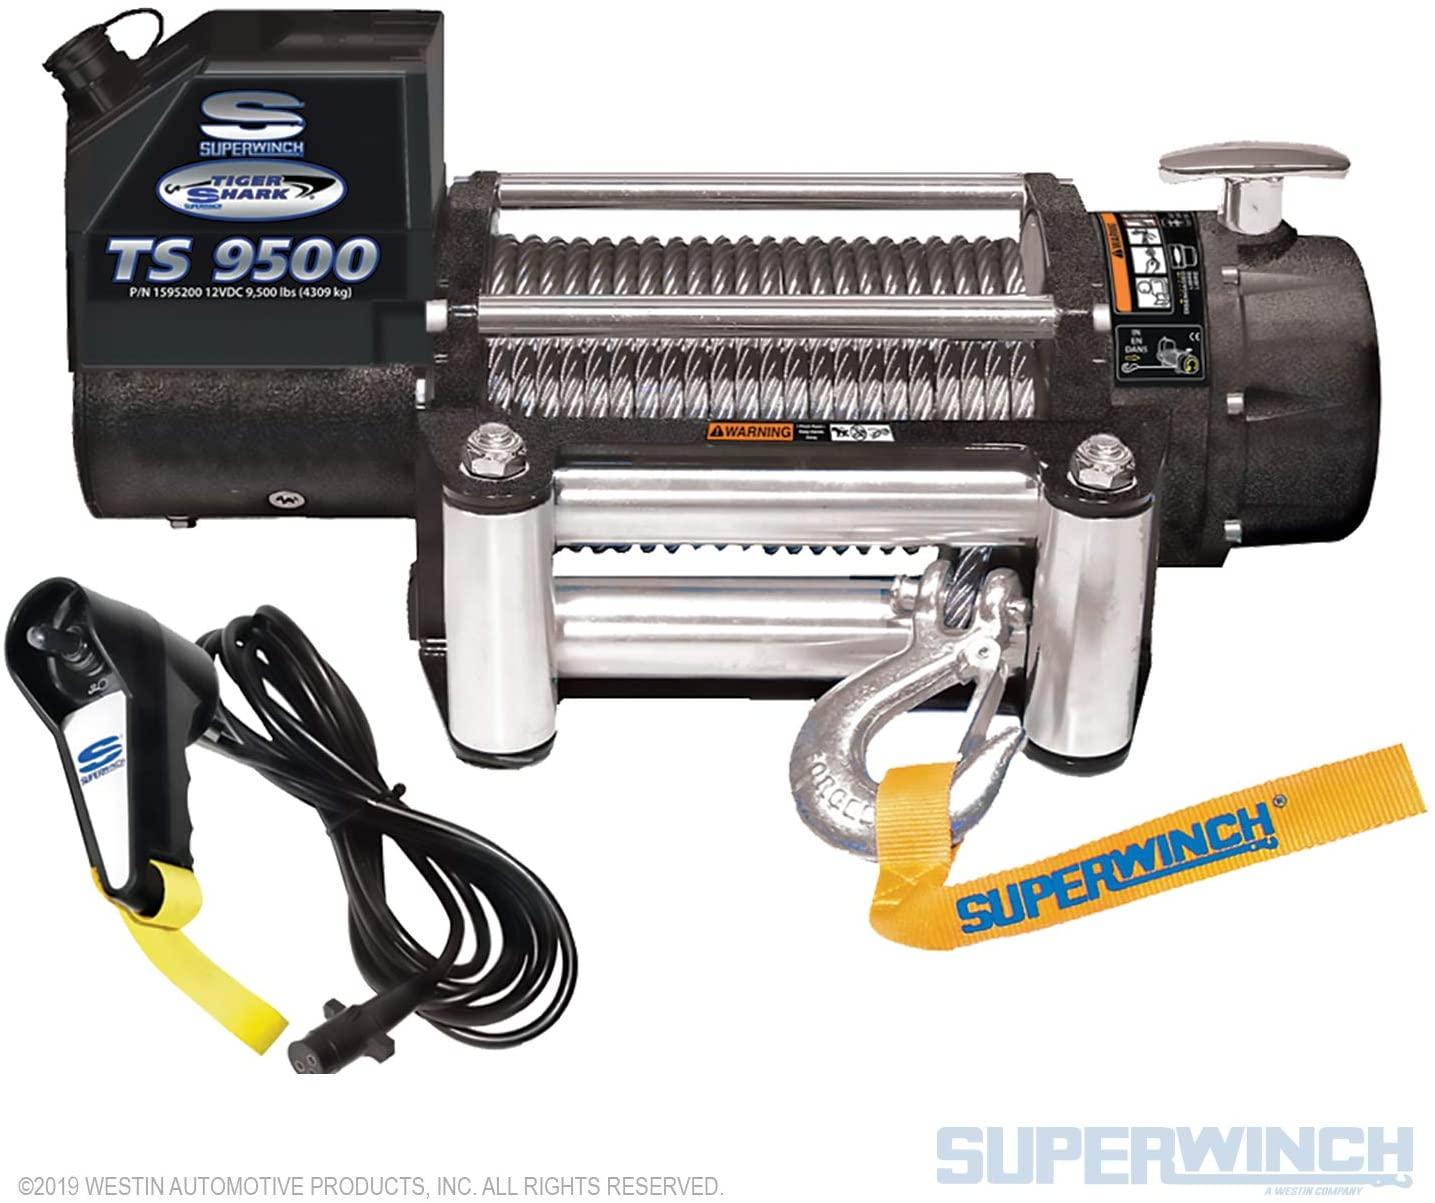 Superwinch 1595200 Tiger Shark 9.5